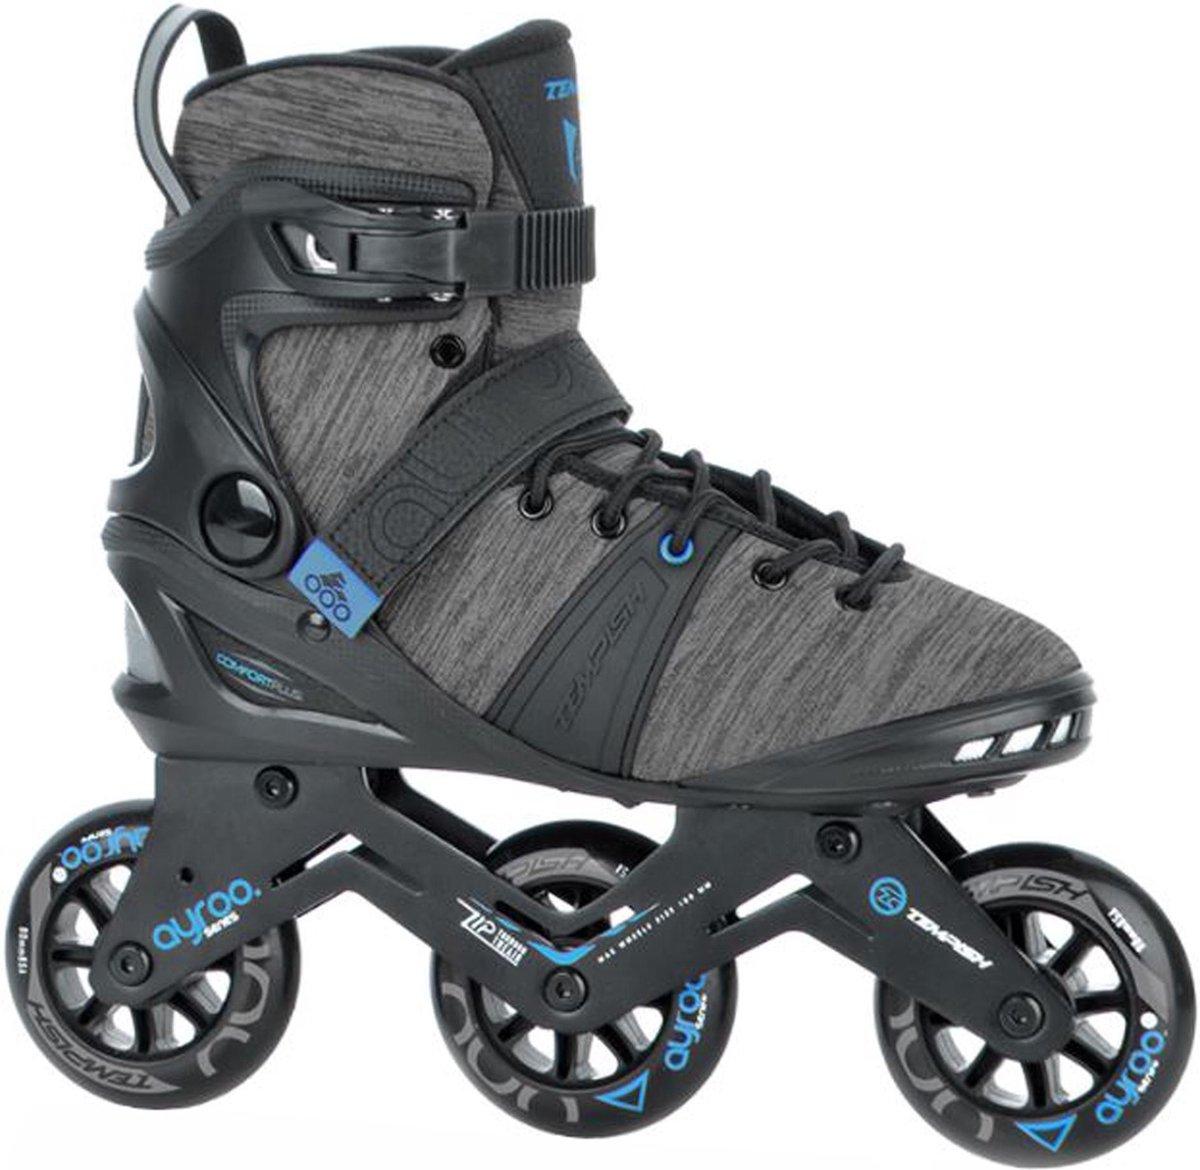 Tempish Ayroo 90 Inlineskates - Maat 38 - Unisex - zwart - grijs - blauw